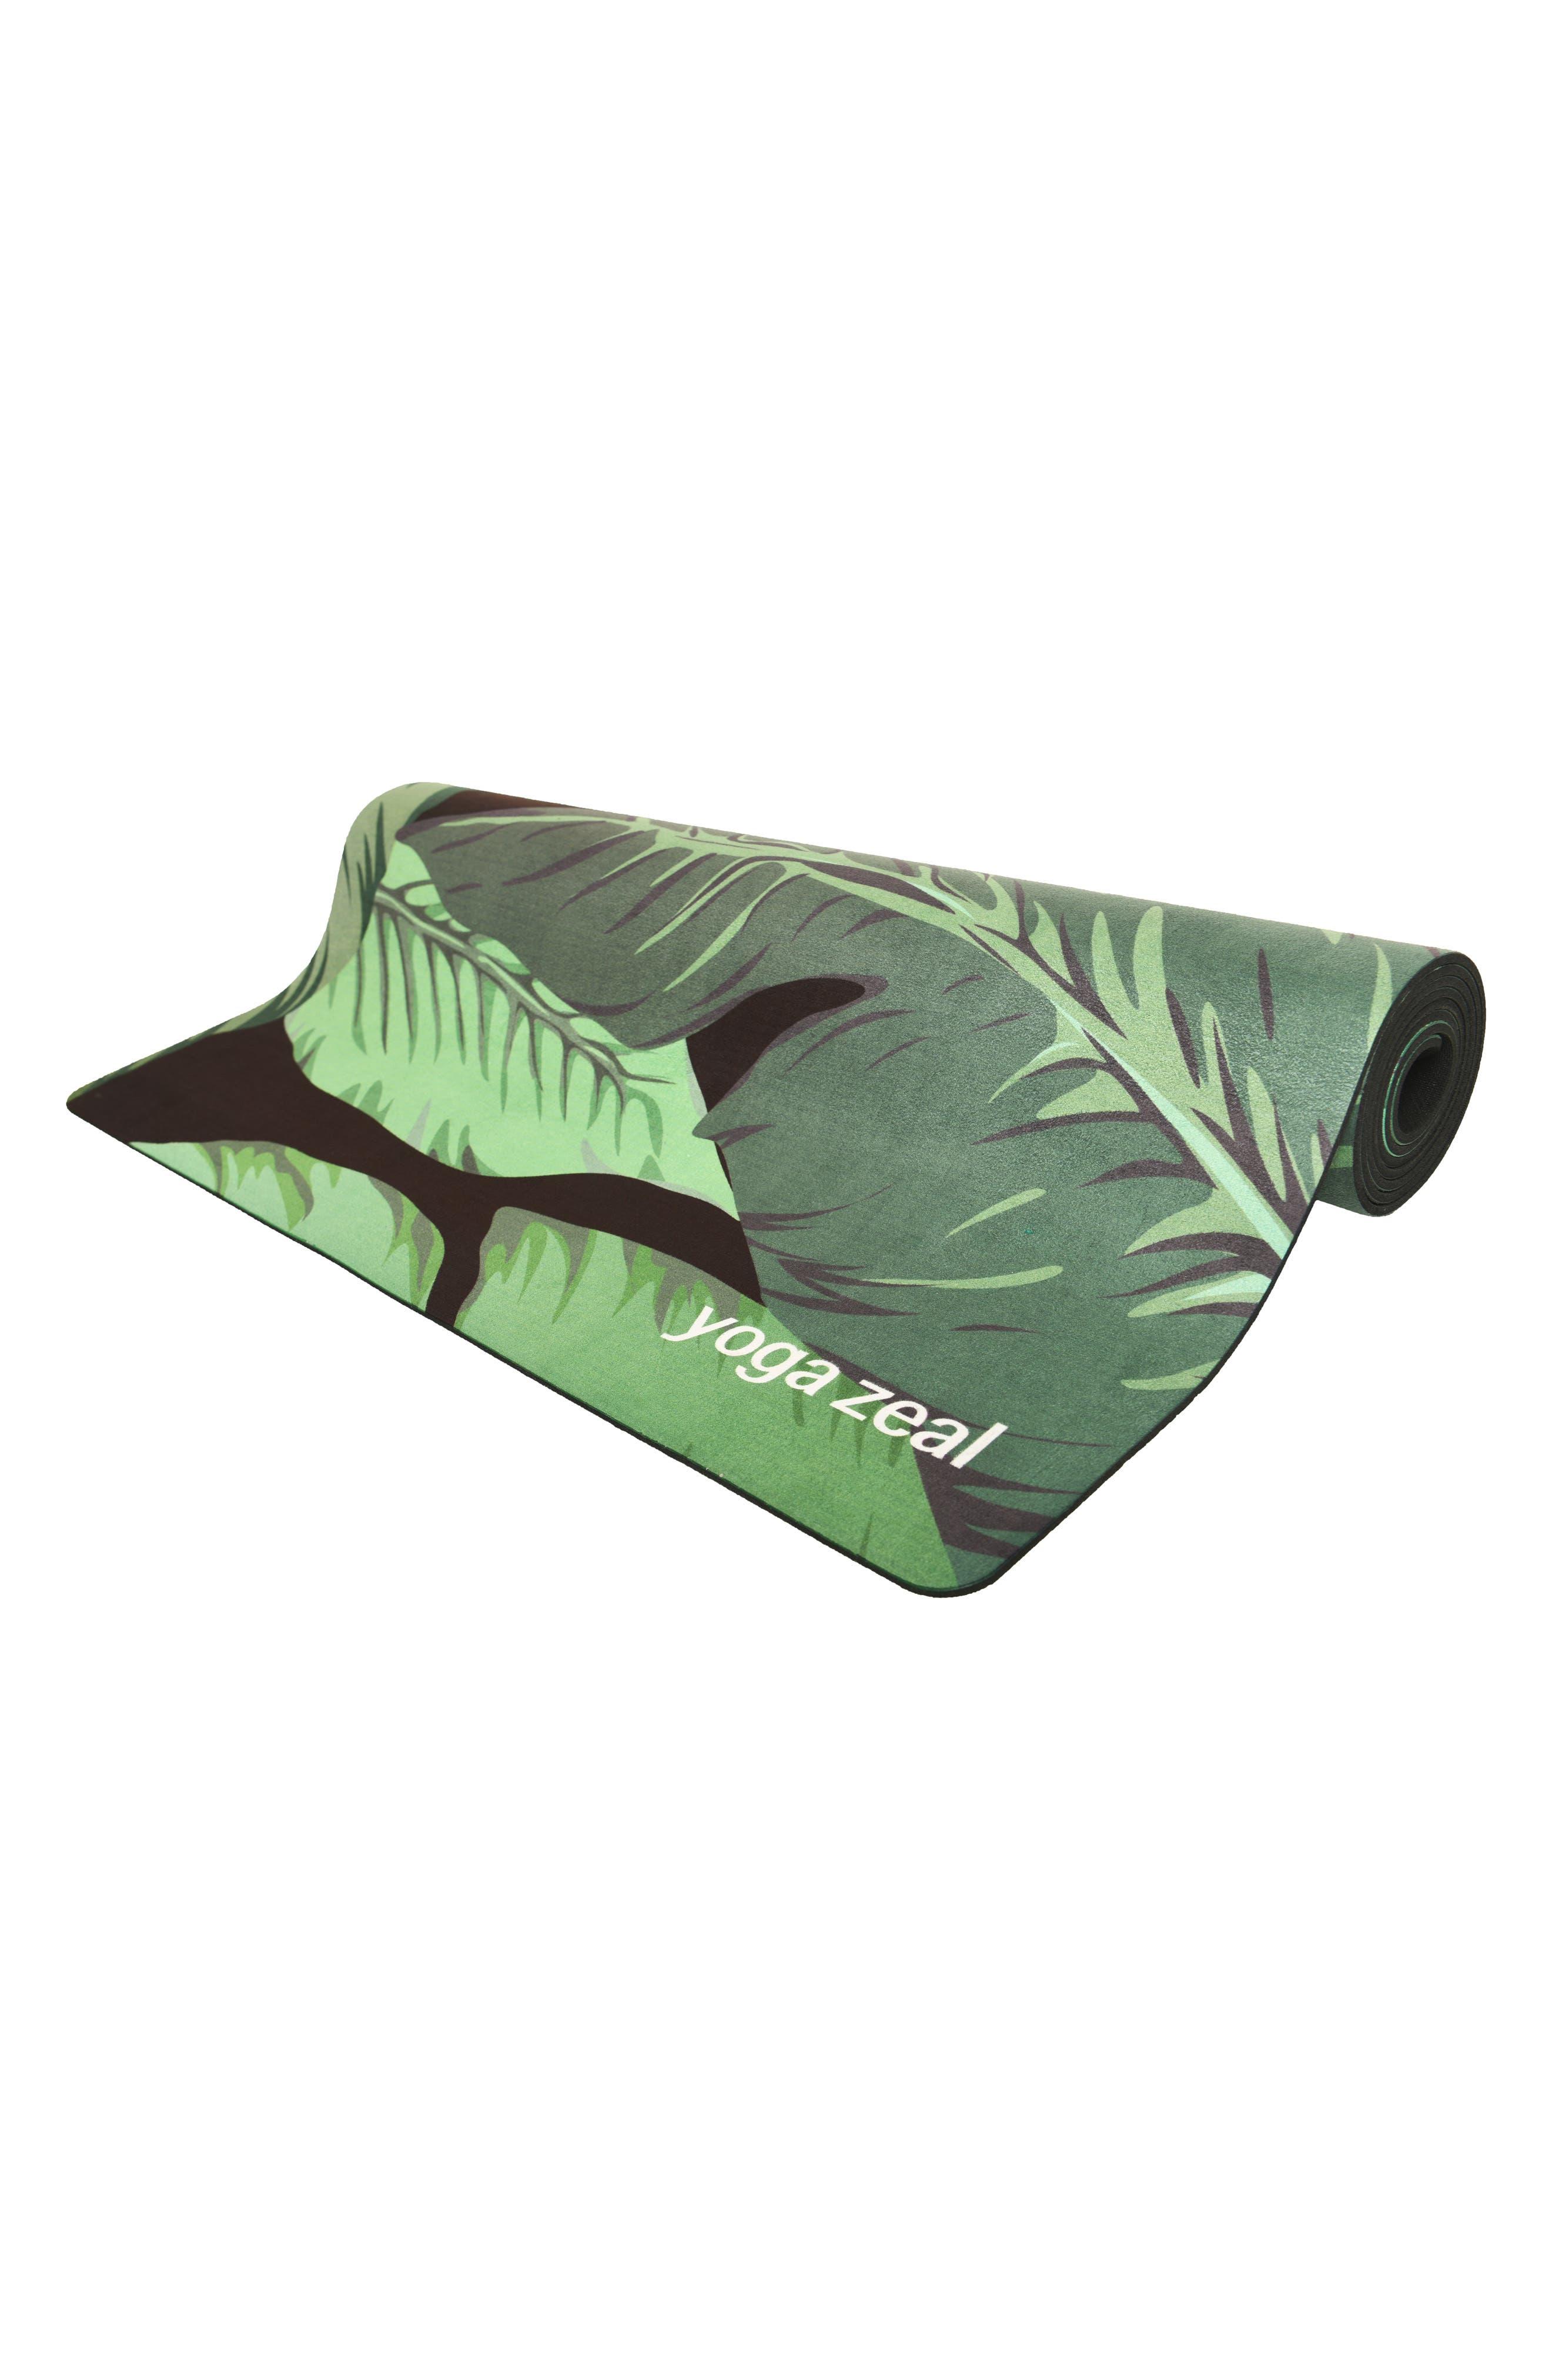 Banana Leaf Print Yoga Mat,                             Alternate thumbnail 3, color,                             BLACK